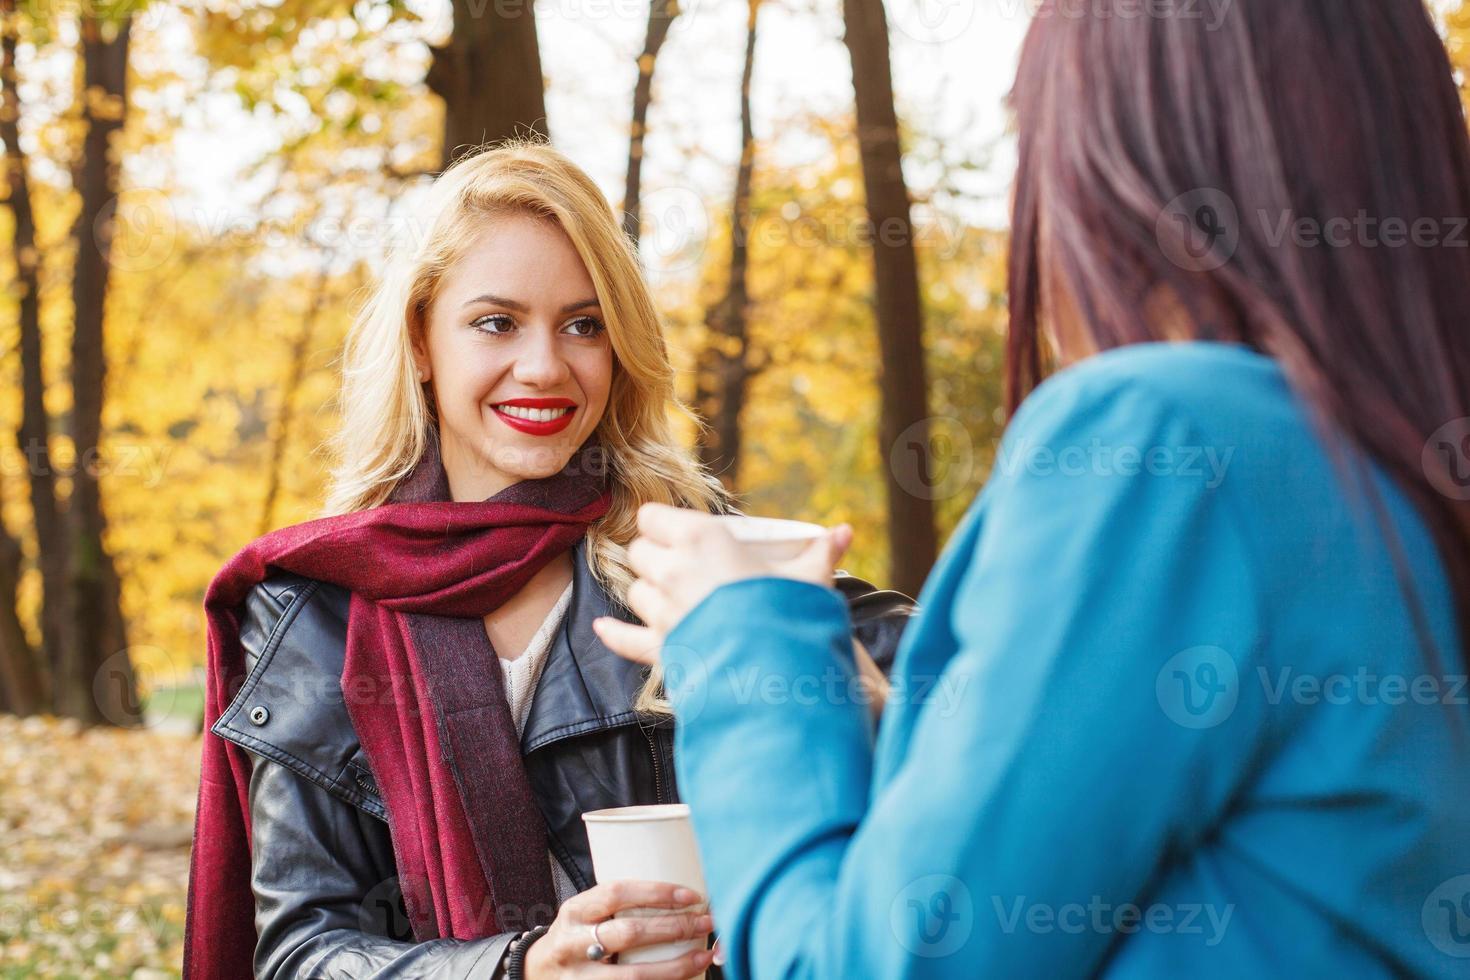 twee vrouwen die koffie drinken in het park foto